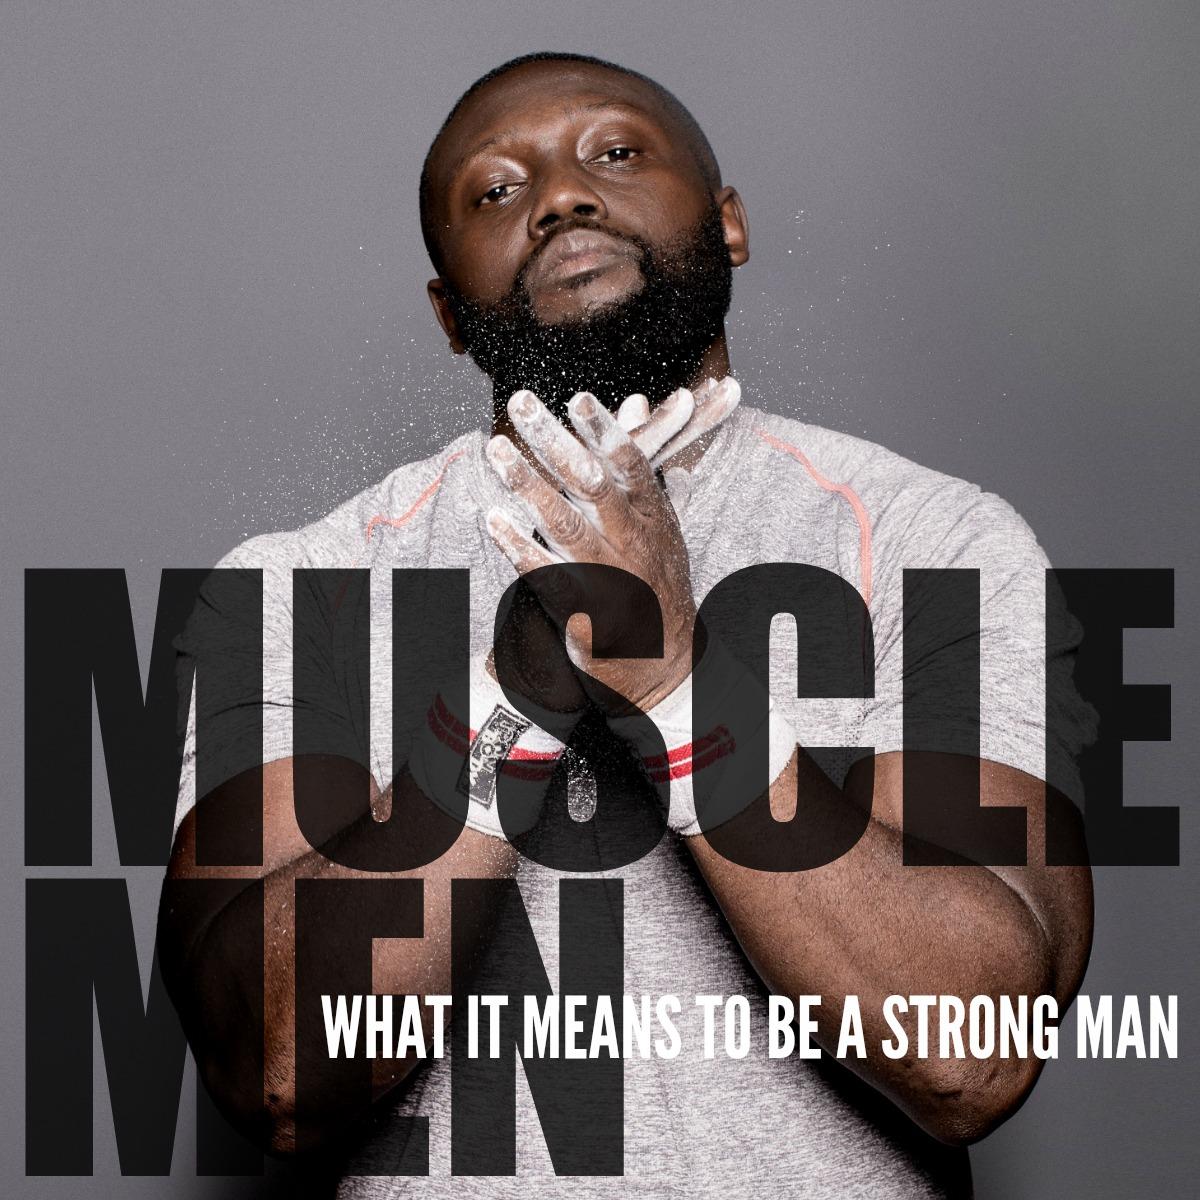 Muscle Men: Week 1